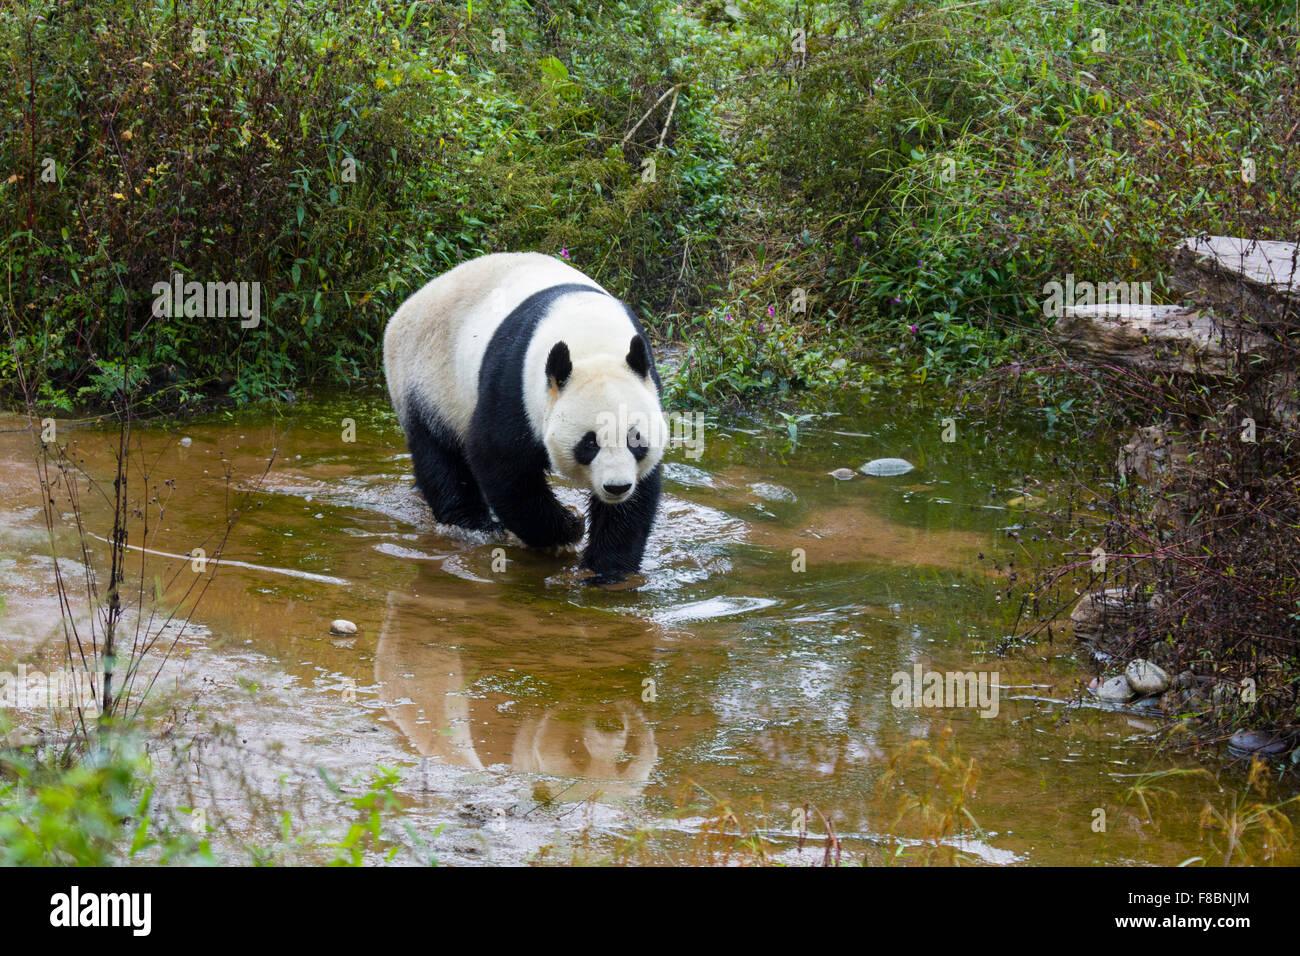 Panda Ailuropoda melanoleuca Bifengia Base Panda nella provincia del Sichuan in Cina MA003064 Immagini Stock